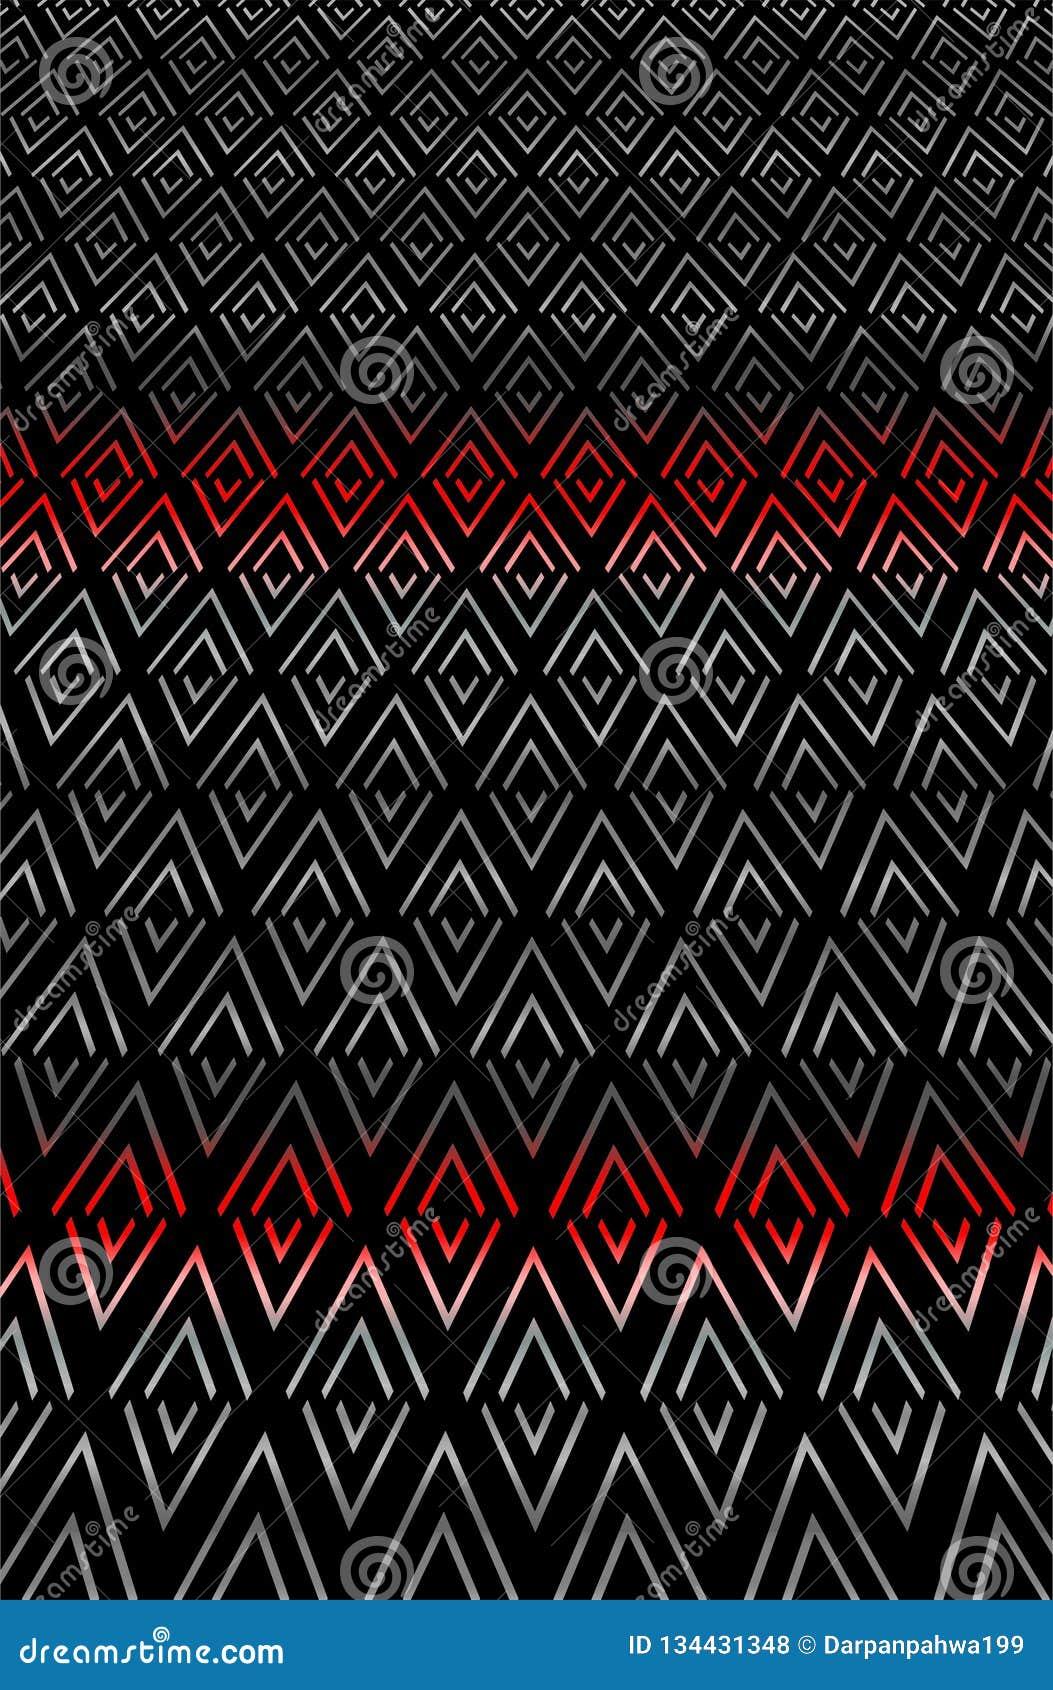 Sharp Zigzag rhombus texture pattern in gradation